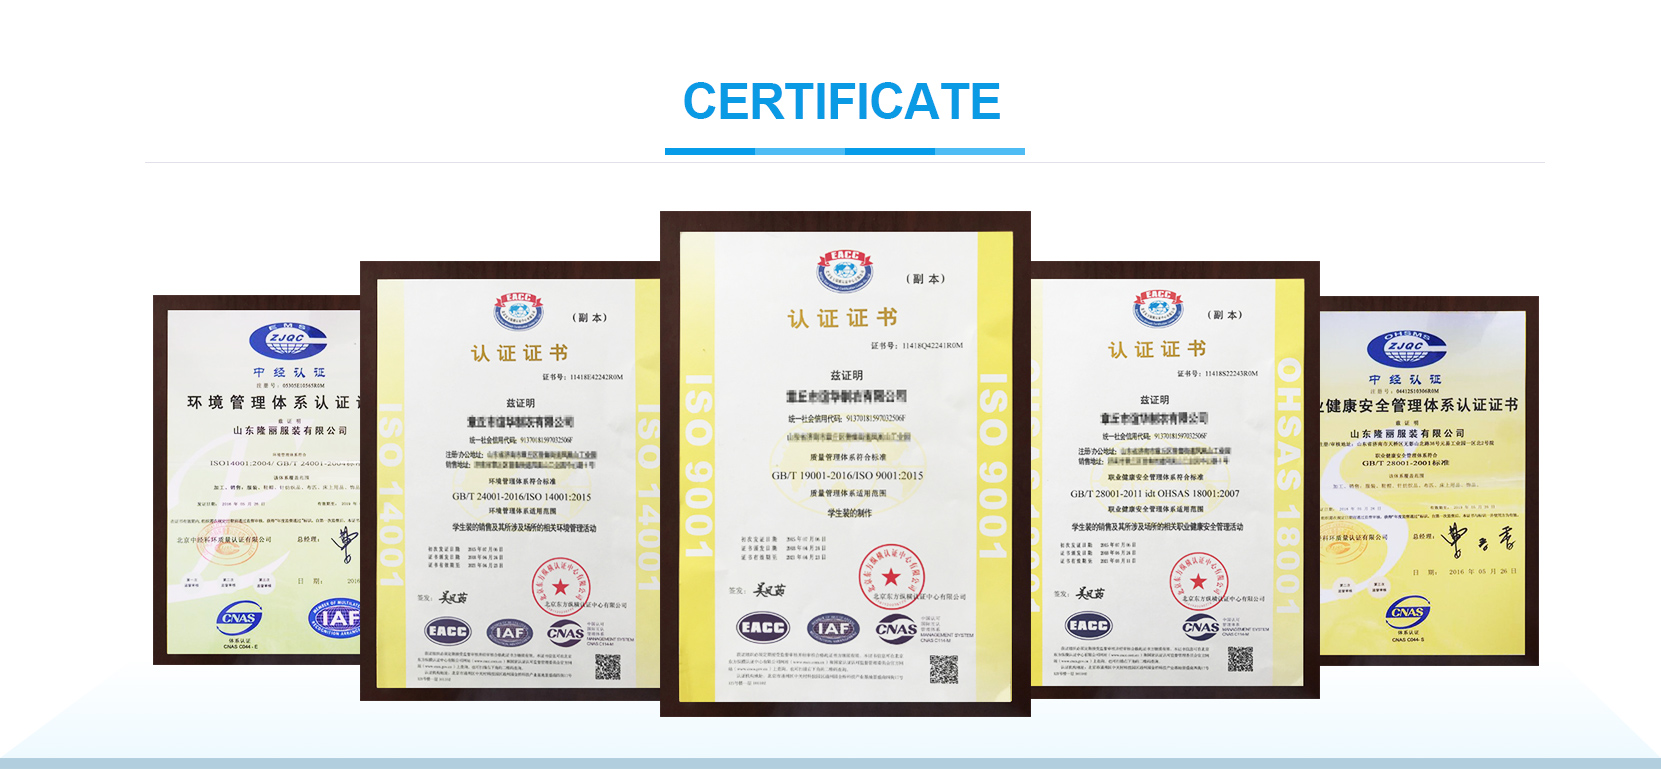 Jinan Fine Certificate